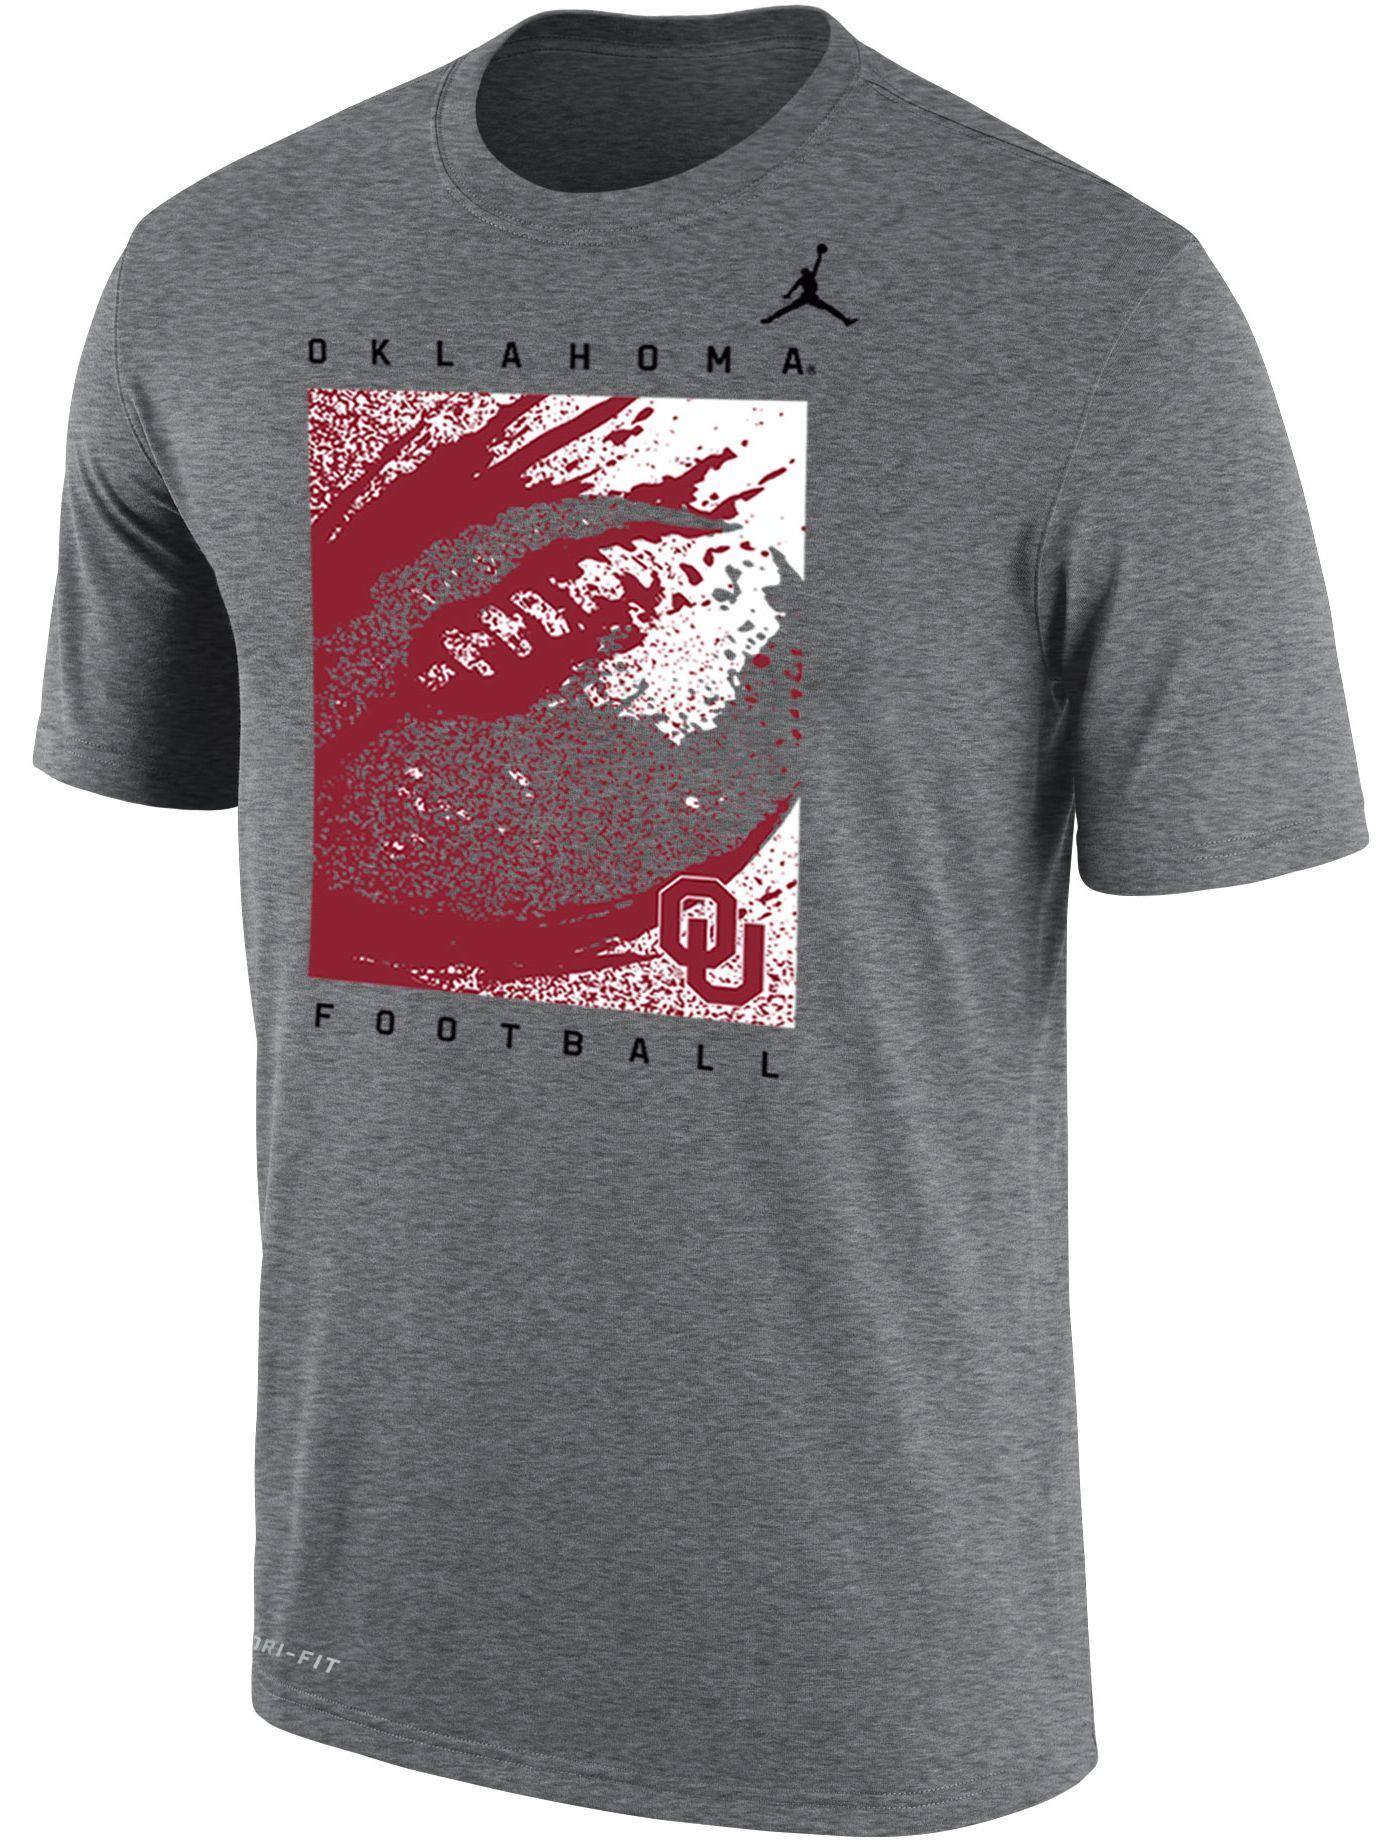 Jordan Men's Oklahoma Sooners Grey Dri-FIT Cotton Football T-Shirt